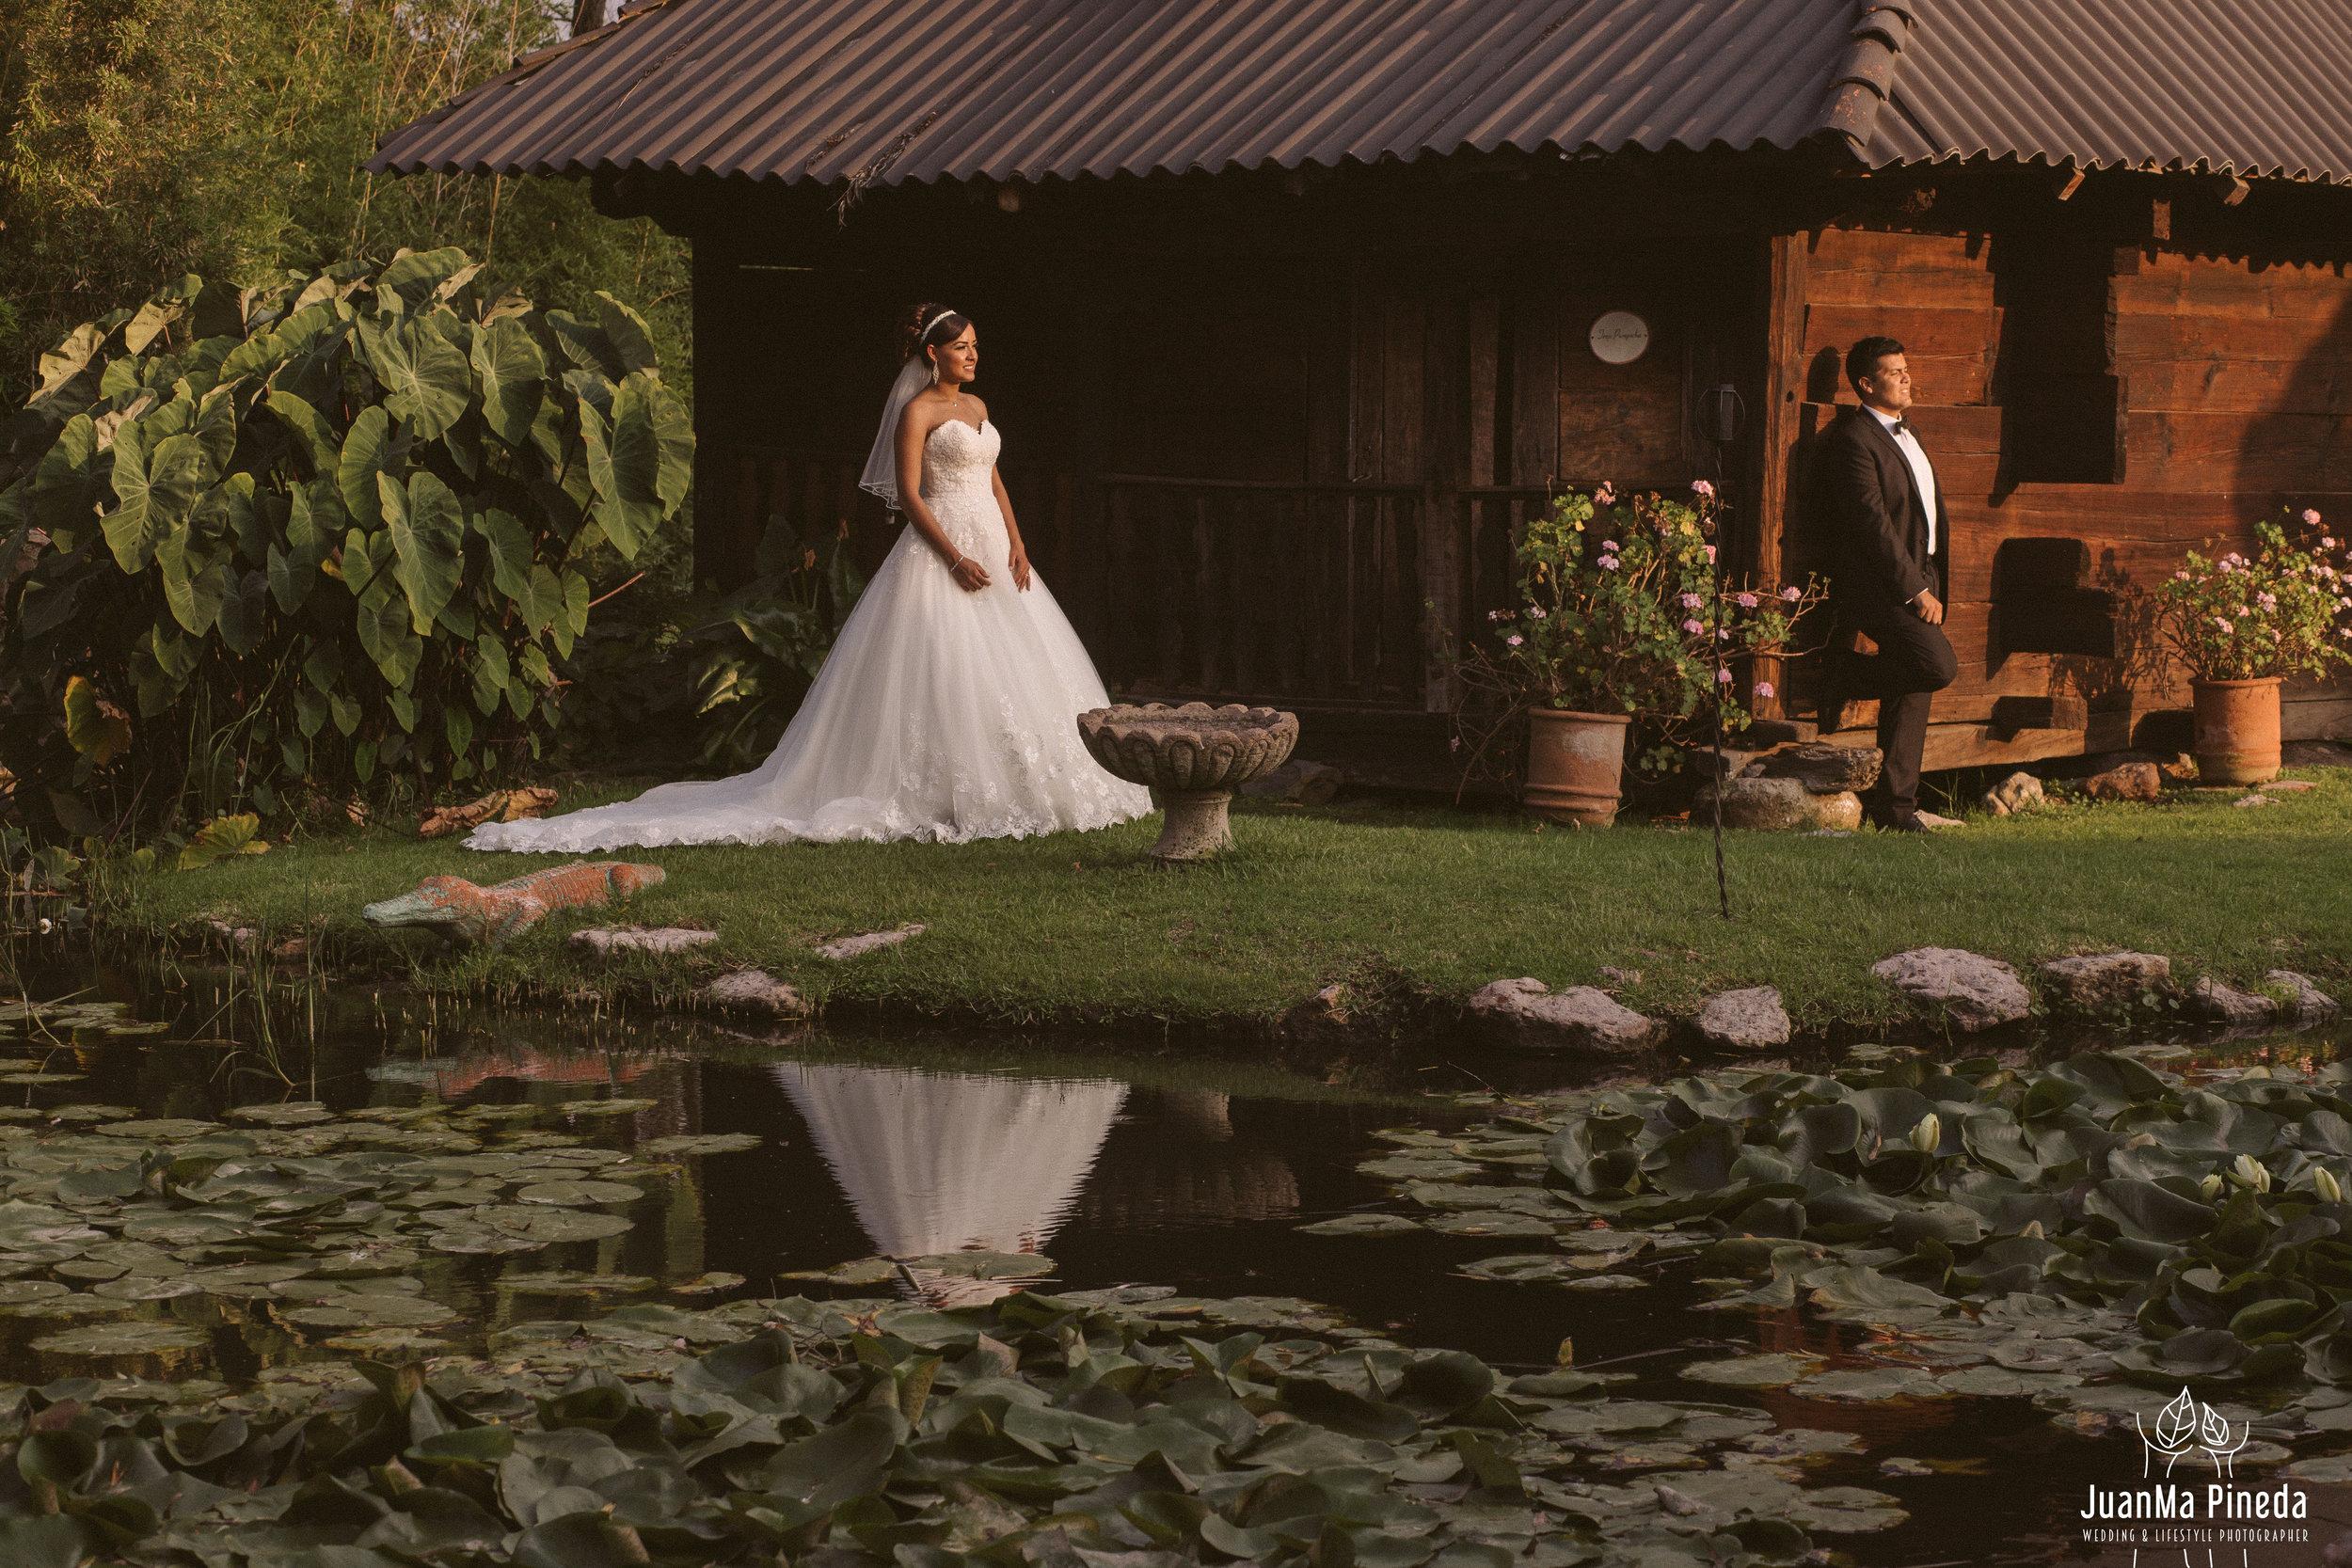 Wedding+Photographer+Mexico-1-6.jpg